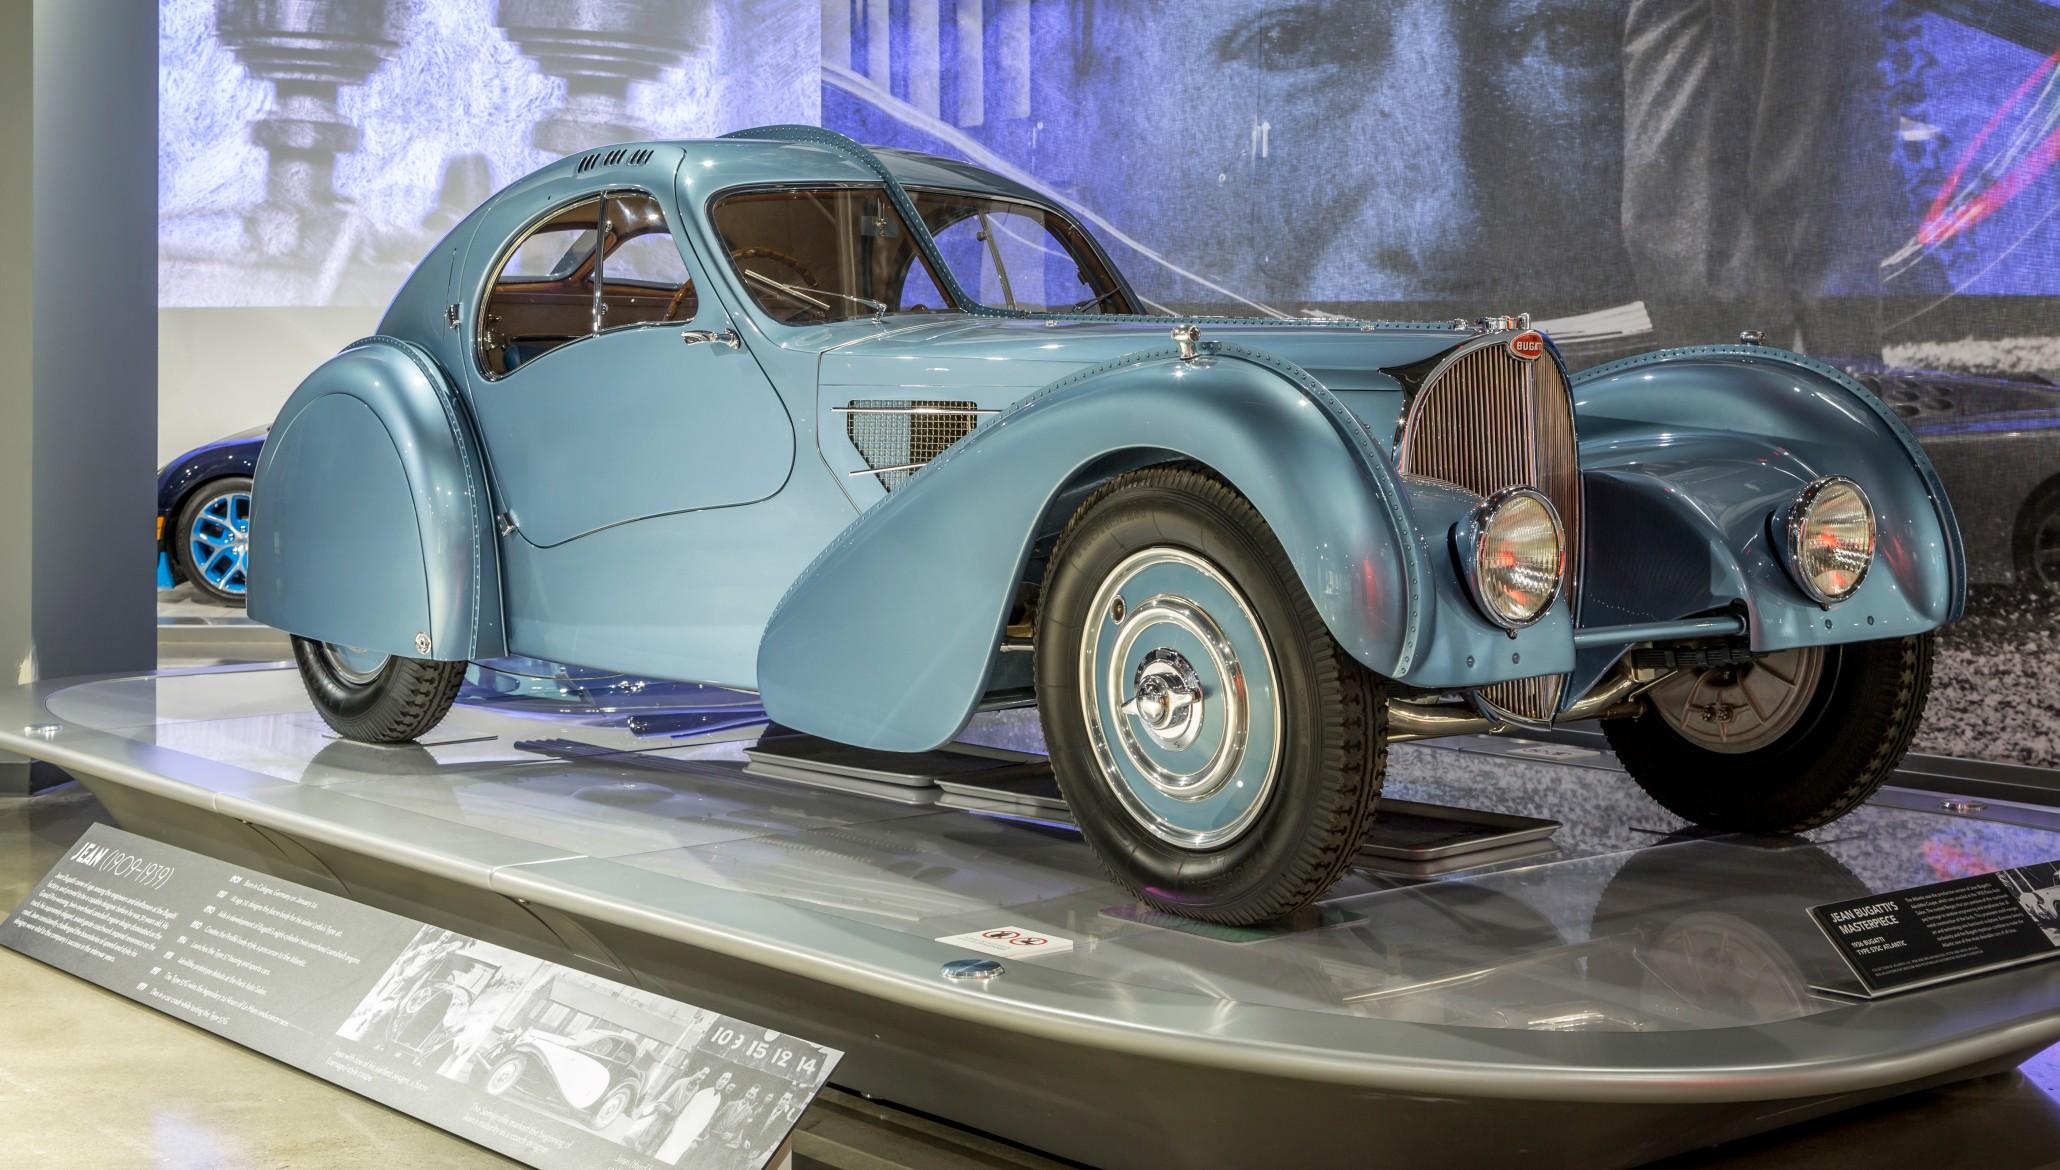 Peter Mullin Muses About His Winning 1936 Bugatti Type 57sc Atlantic Robb Report